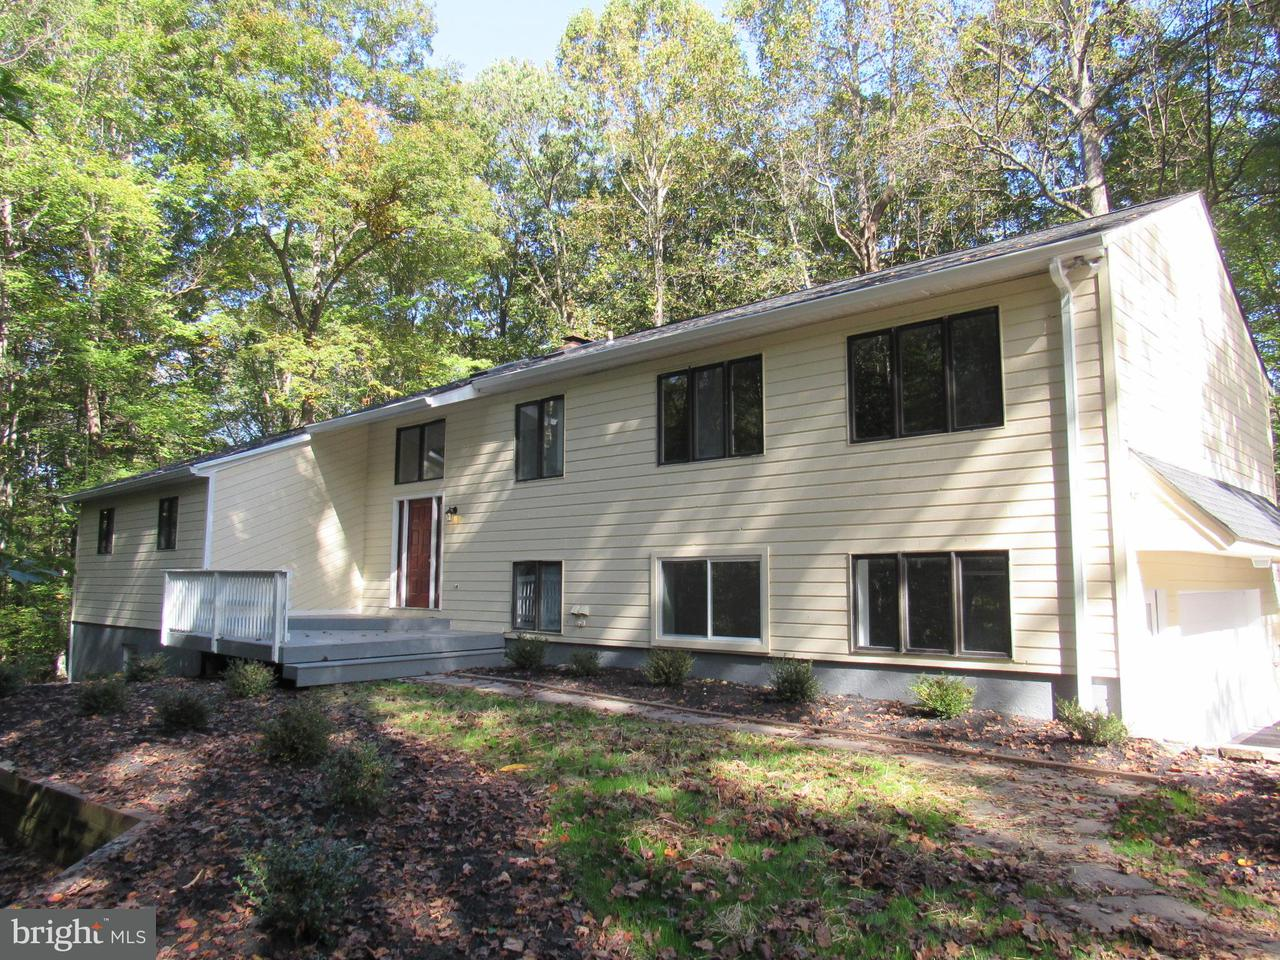 Casa Unifamiliar por un Venta en 280 SOUTHLAND Court 280 SOUTHLAND Court Dunkirk, Maryland 20754 Estados Unidos